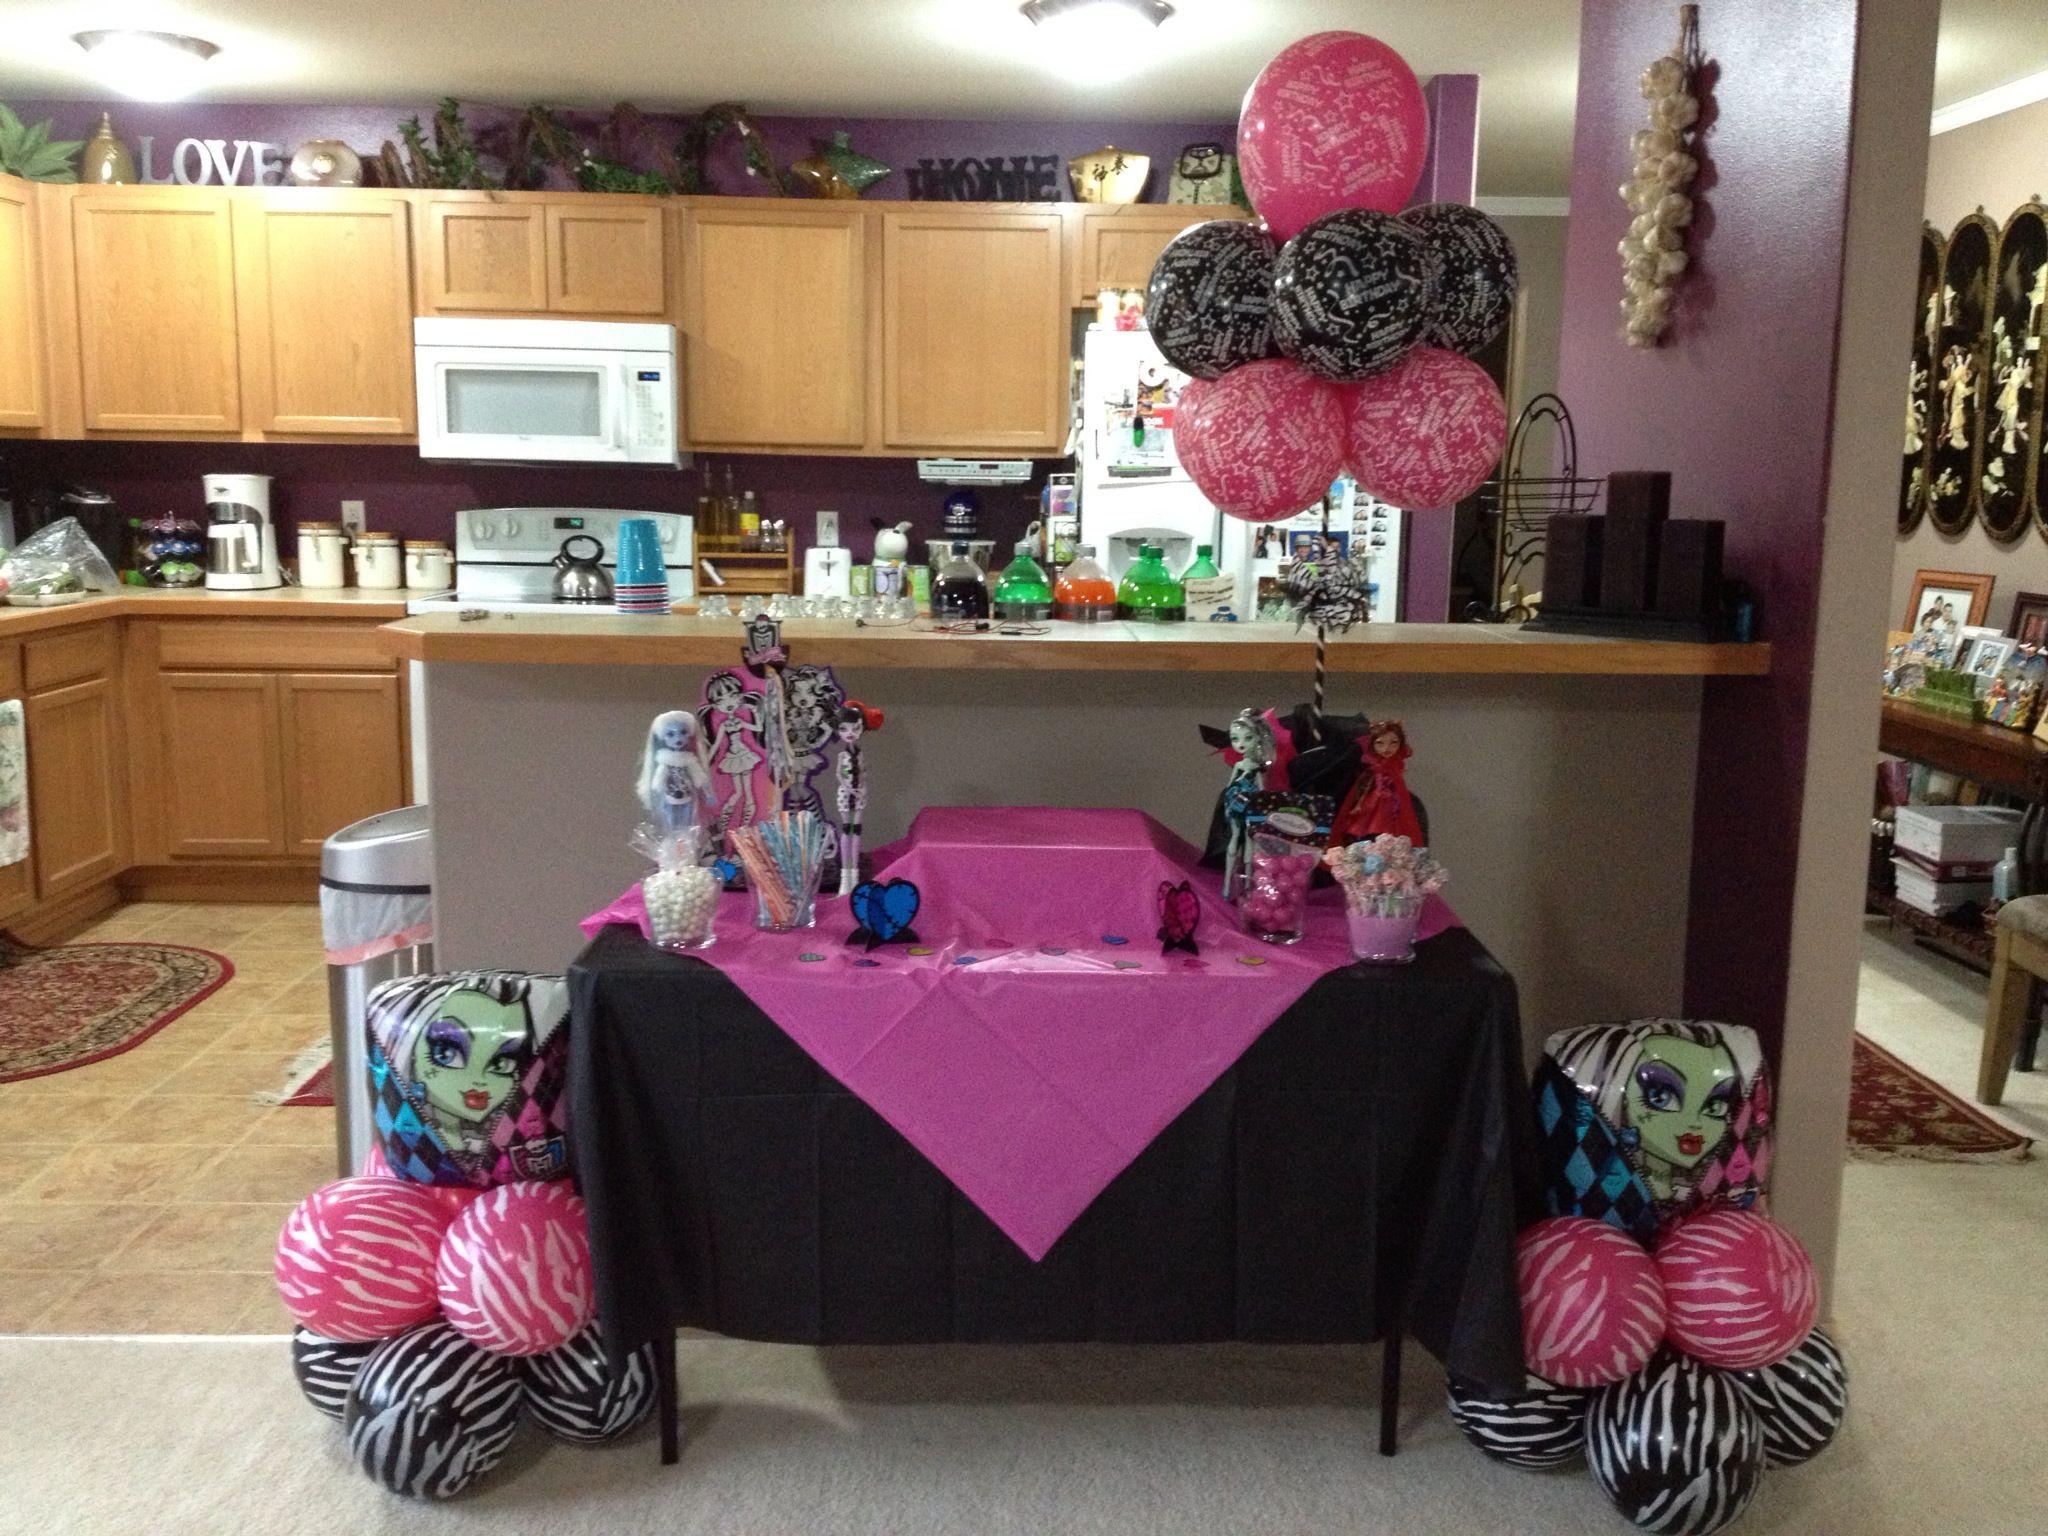 Lens Bday Cake Table Set Up For Her Monster High Bash